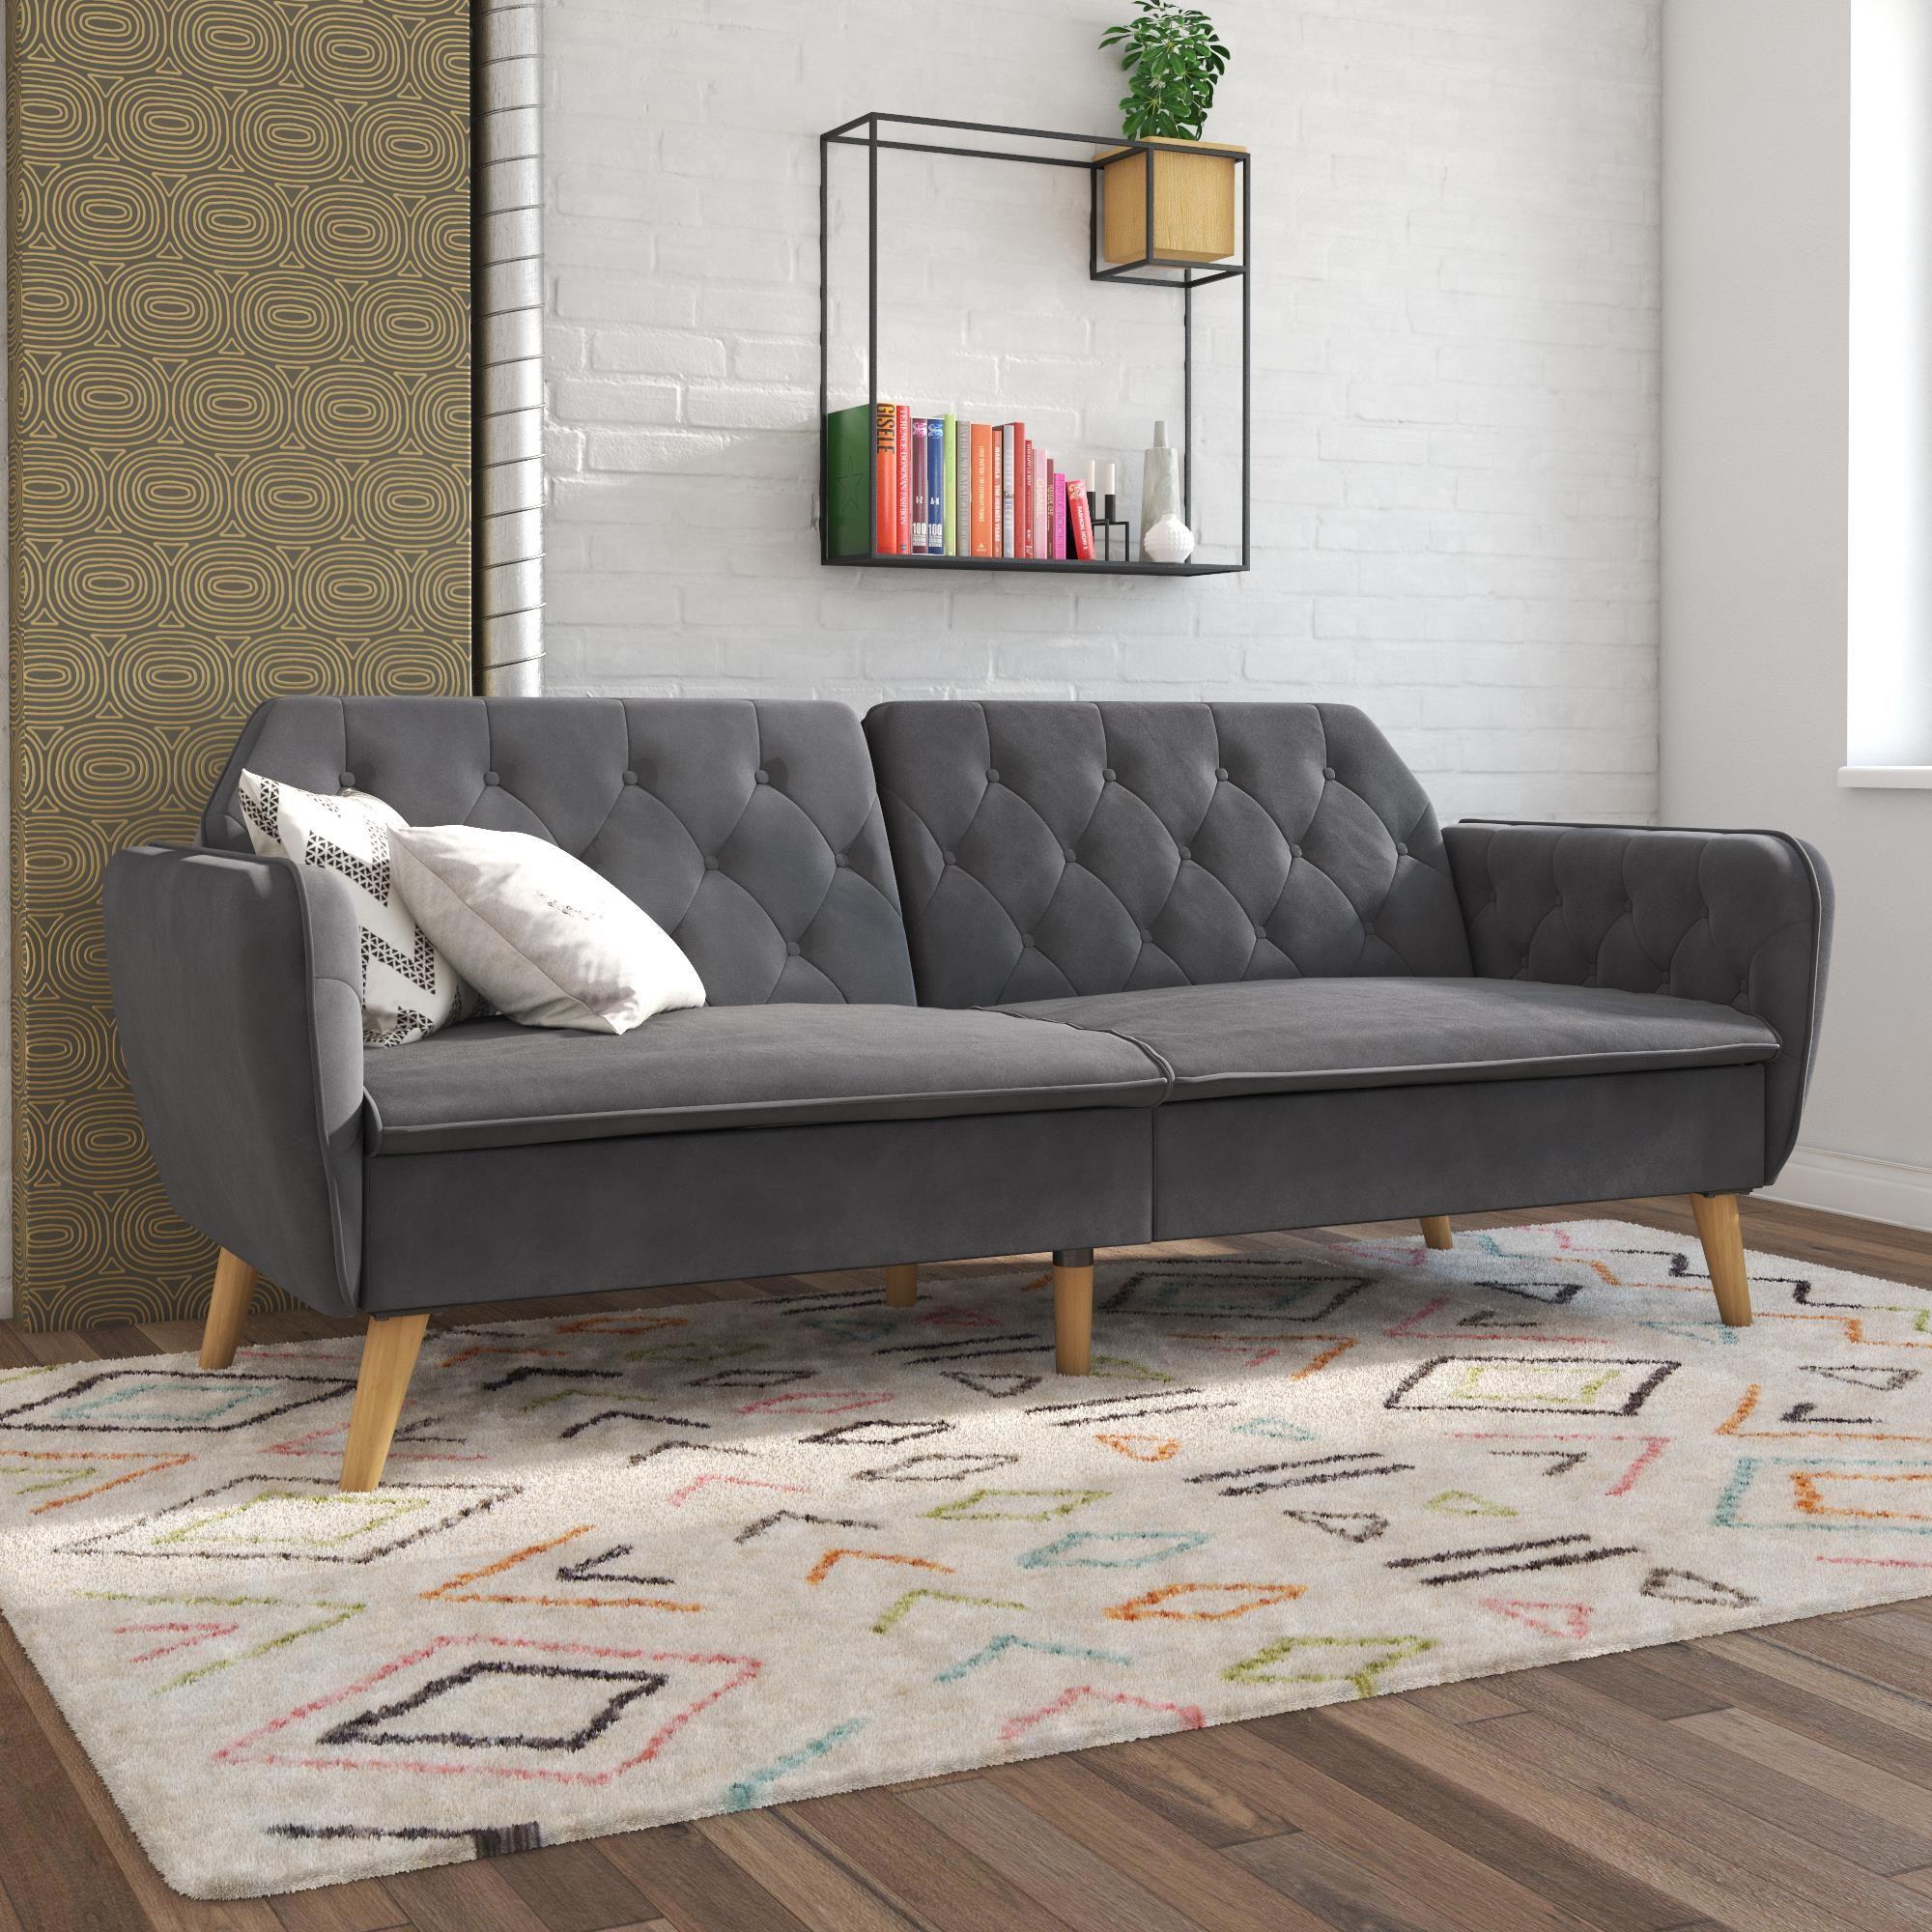 The novogratz tallulah memory foam futon is exactly what you need